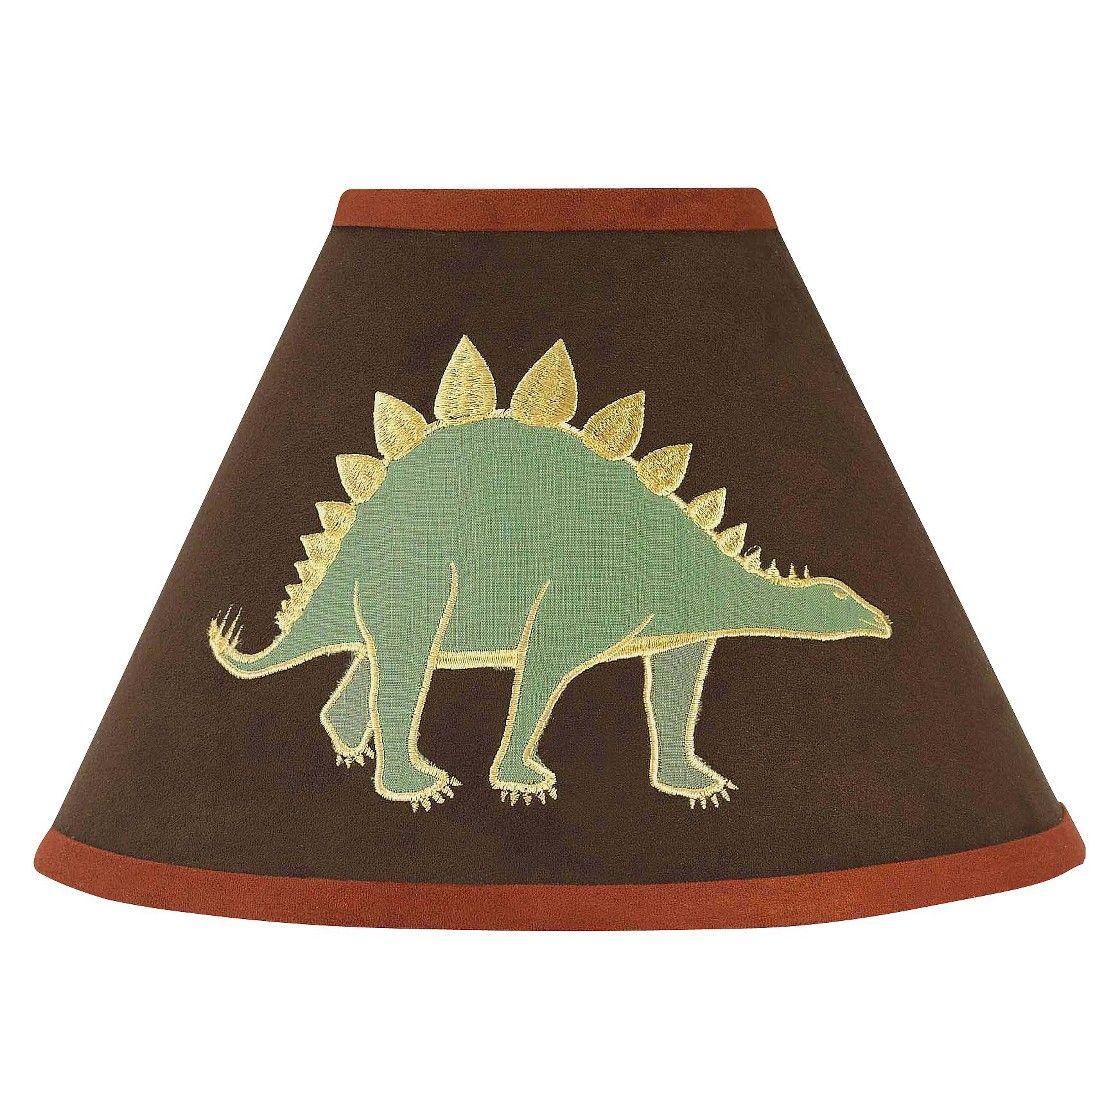 Sweet jojo designs construction zone lamp shade free shipping on - Sweet Jojo Designs Dinosaur Land Lamp Shade